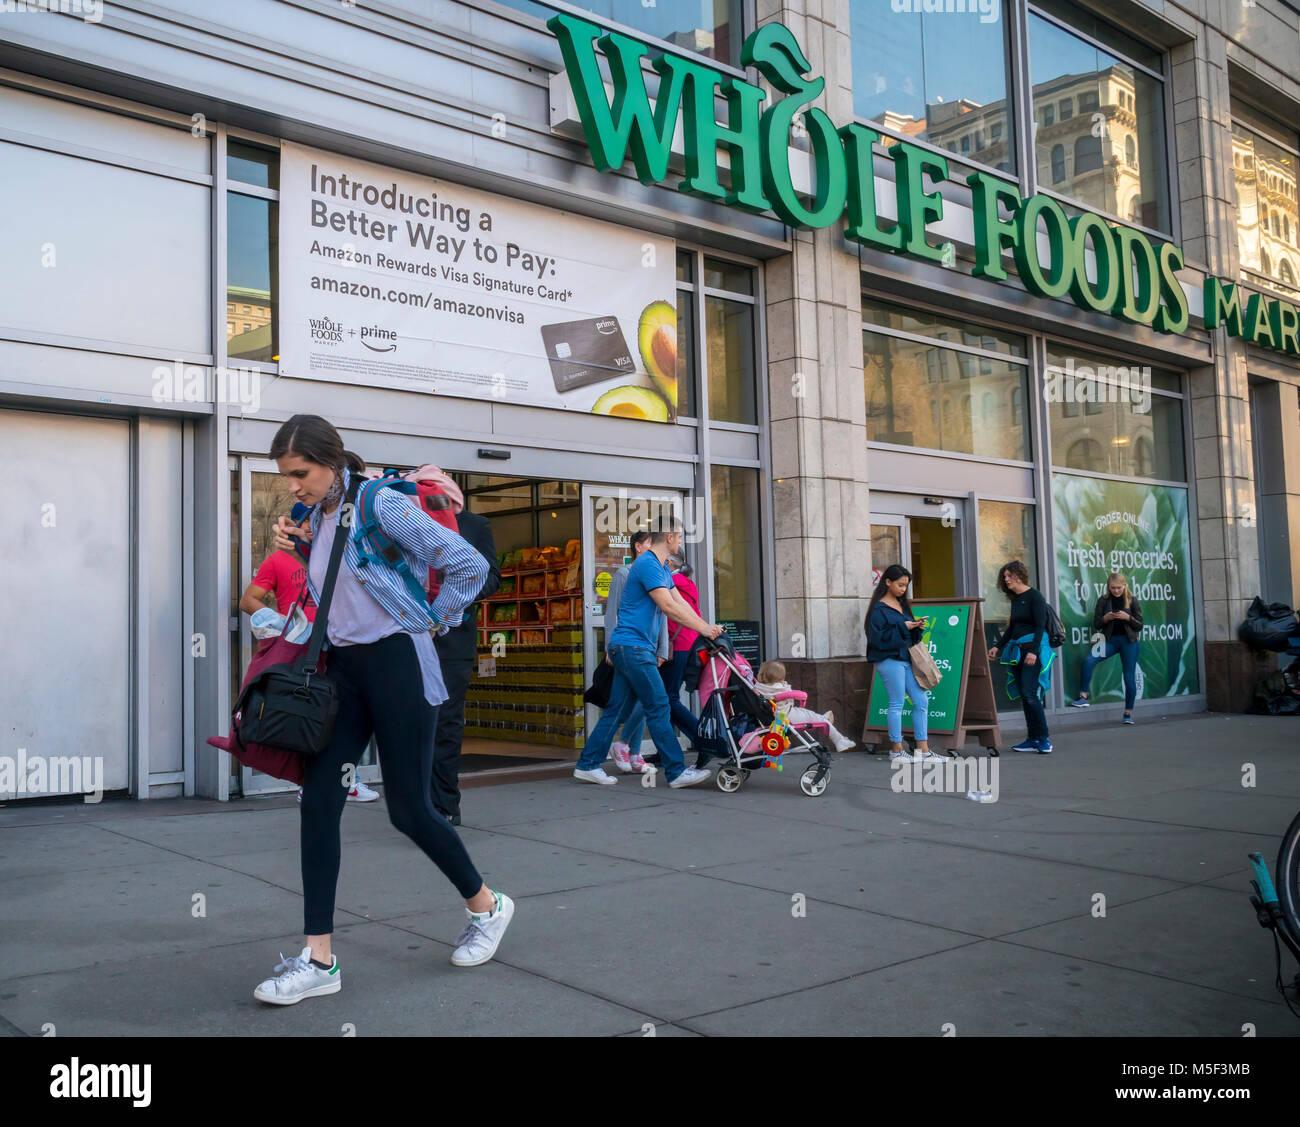 Whole Foods Rewards New York